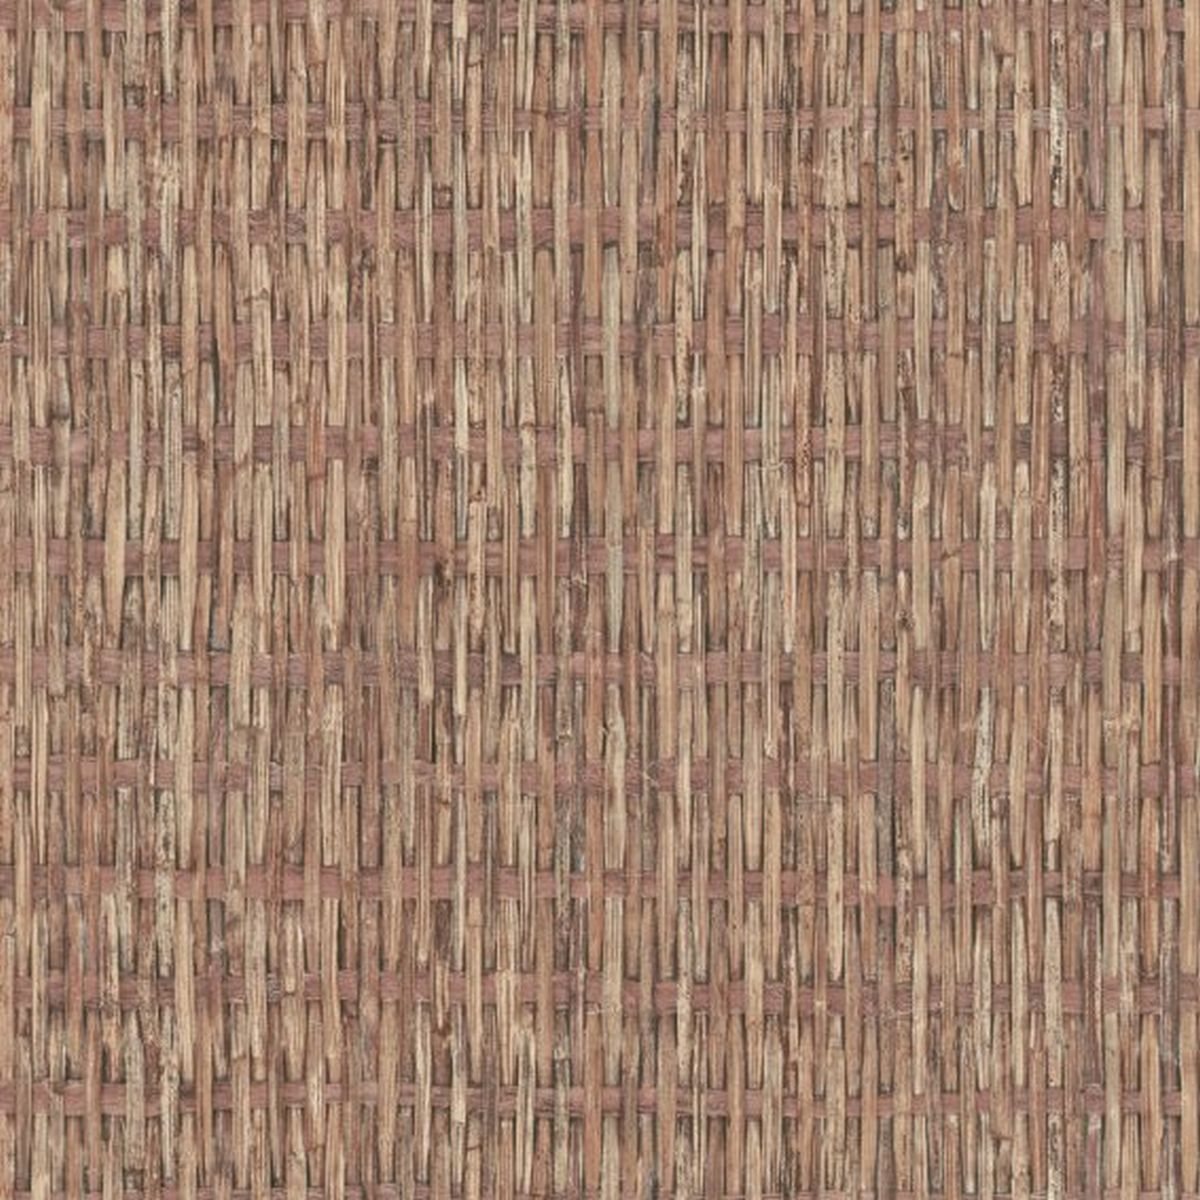 Erismann Vlies Tapete Kollektion Instawalls 639311 Holzoptik günstig online kaufen